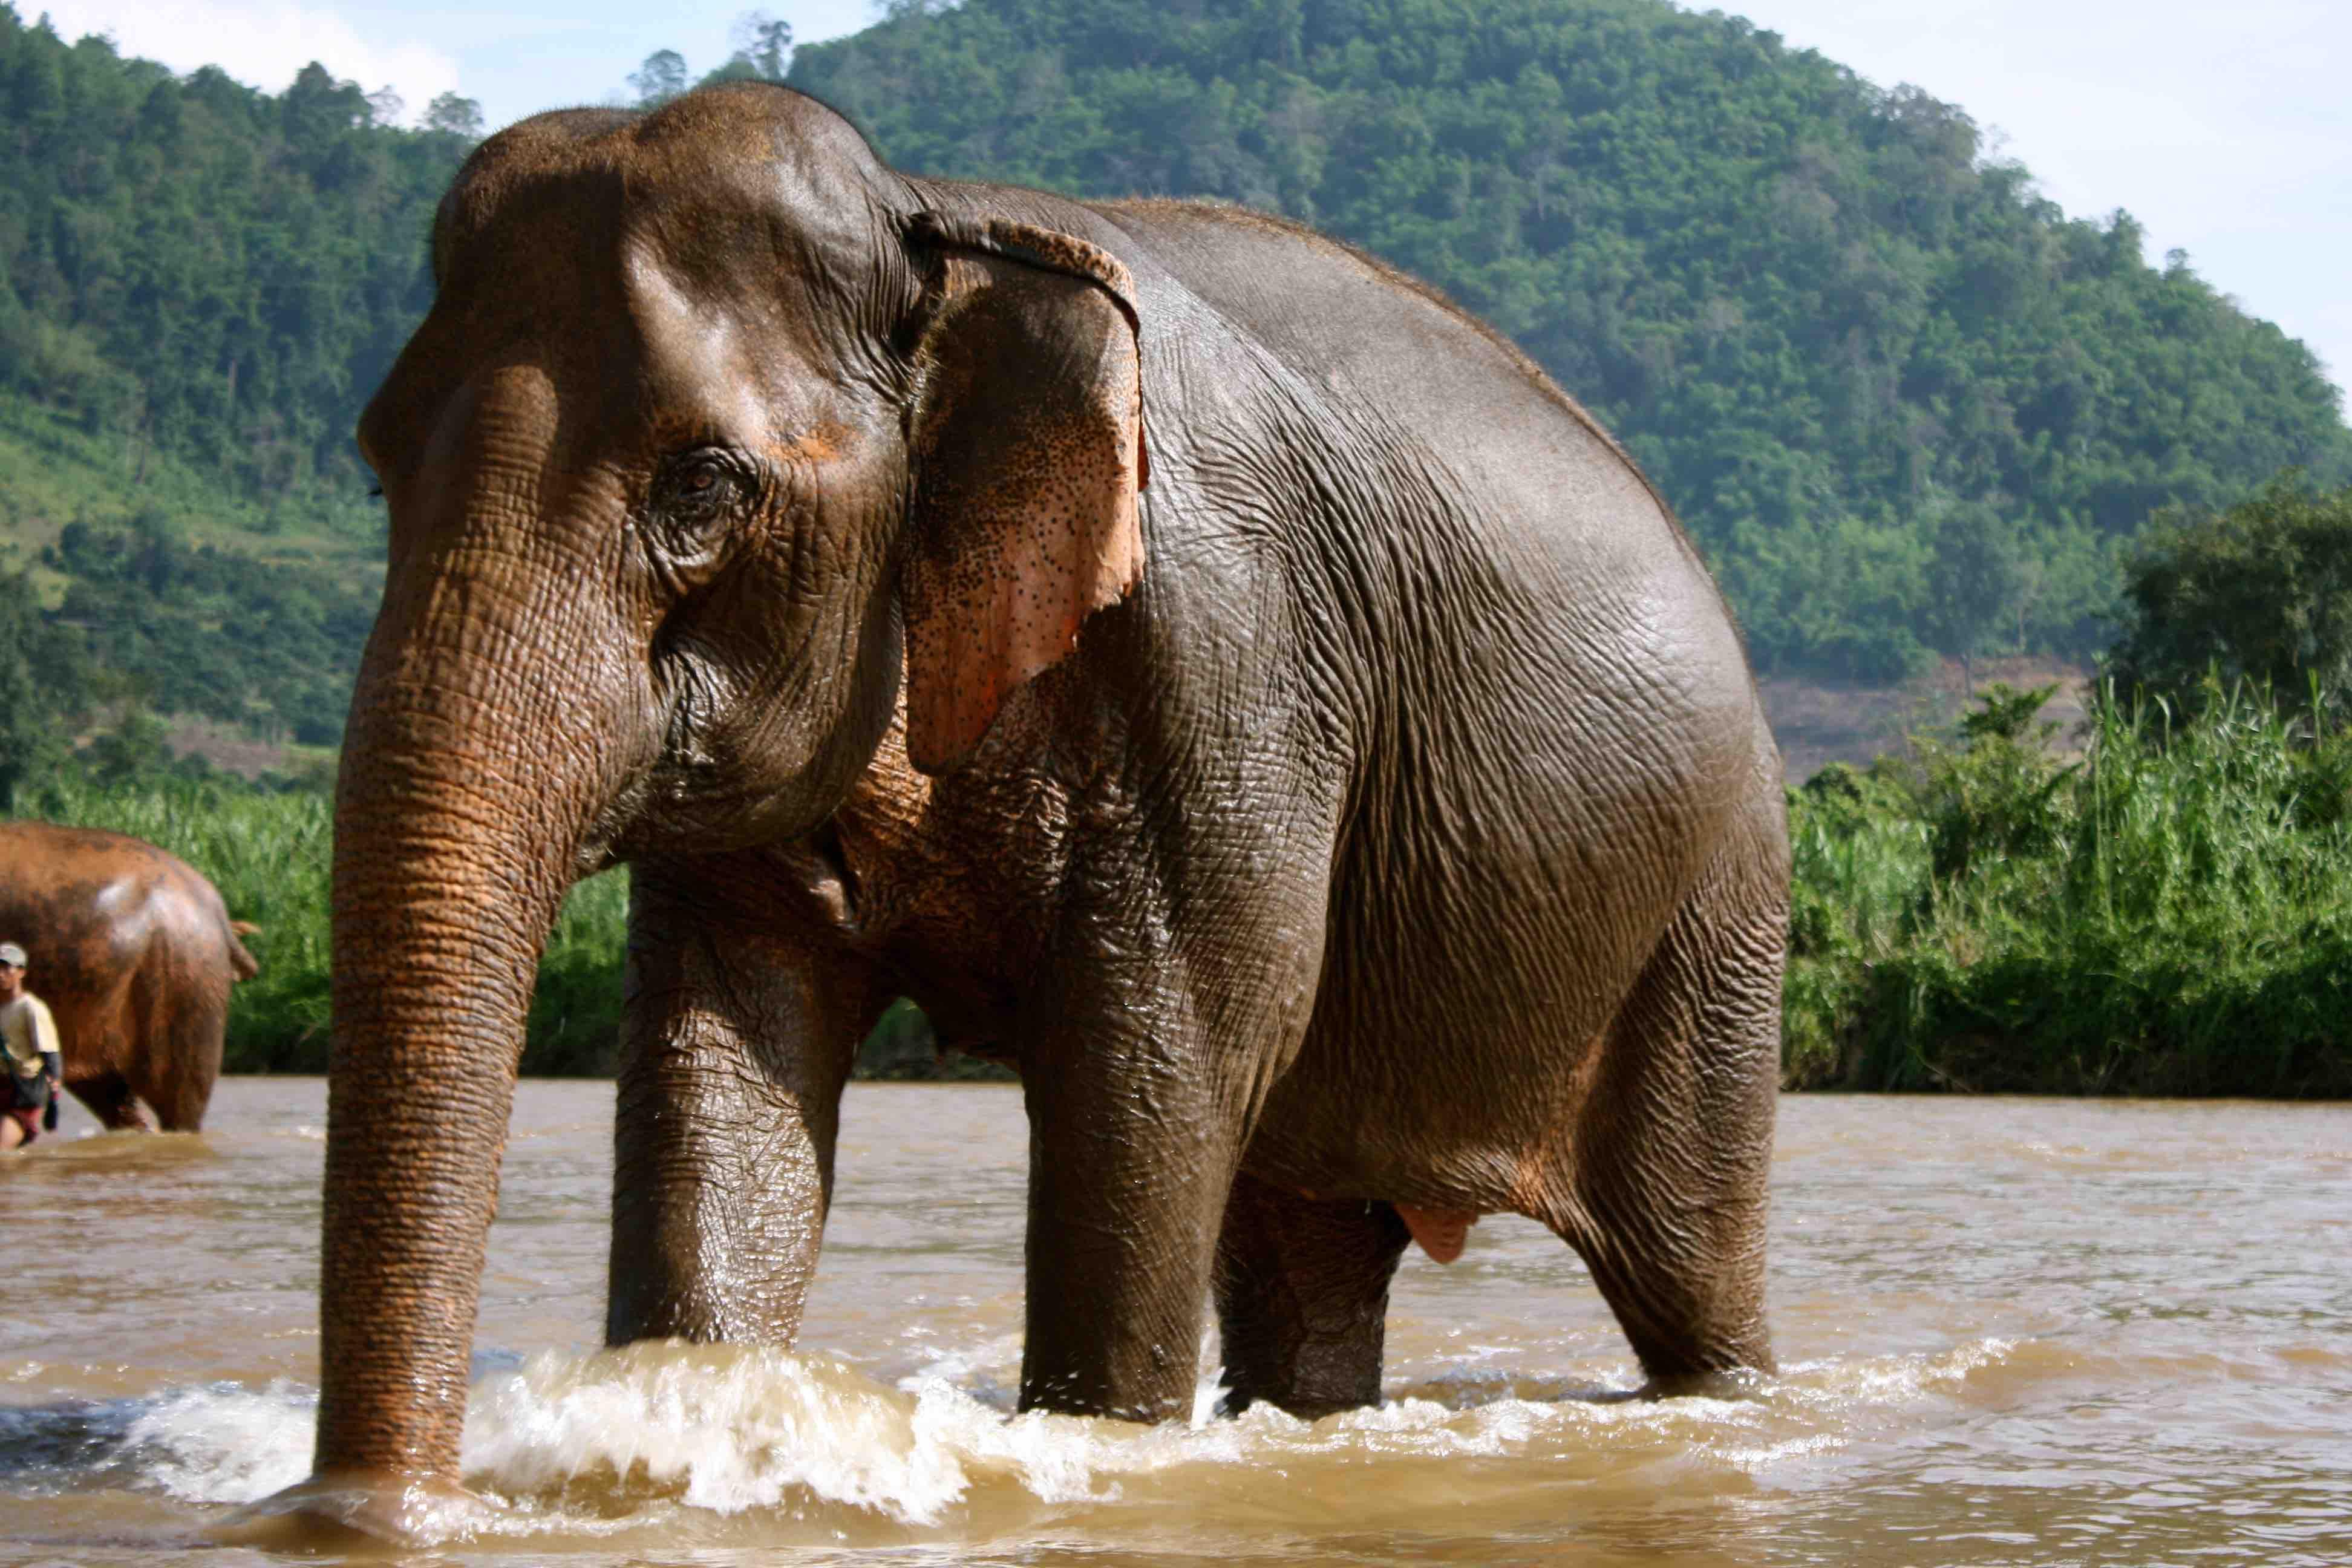 World___Thailand_Elephant_bathing_in_the_resort_of_Chiang_Rai__Thailand_061869_